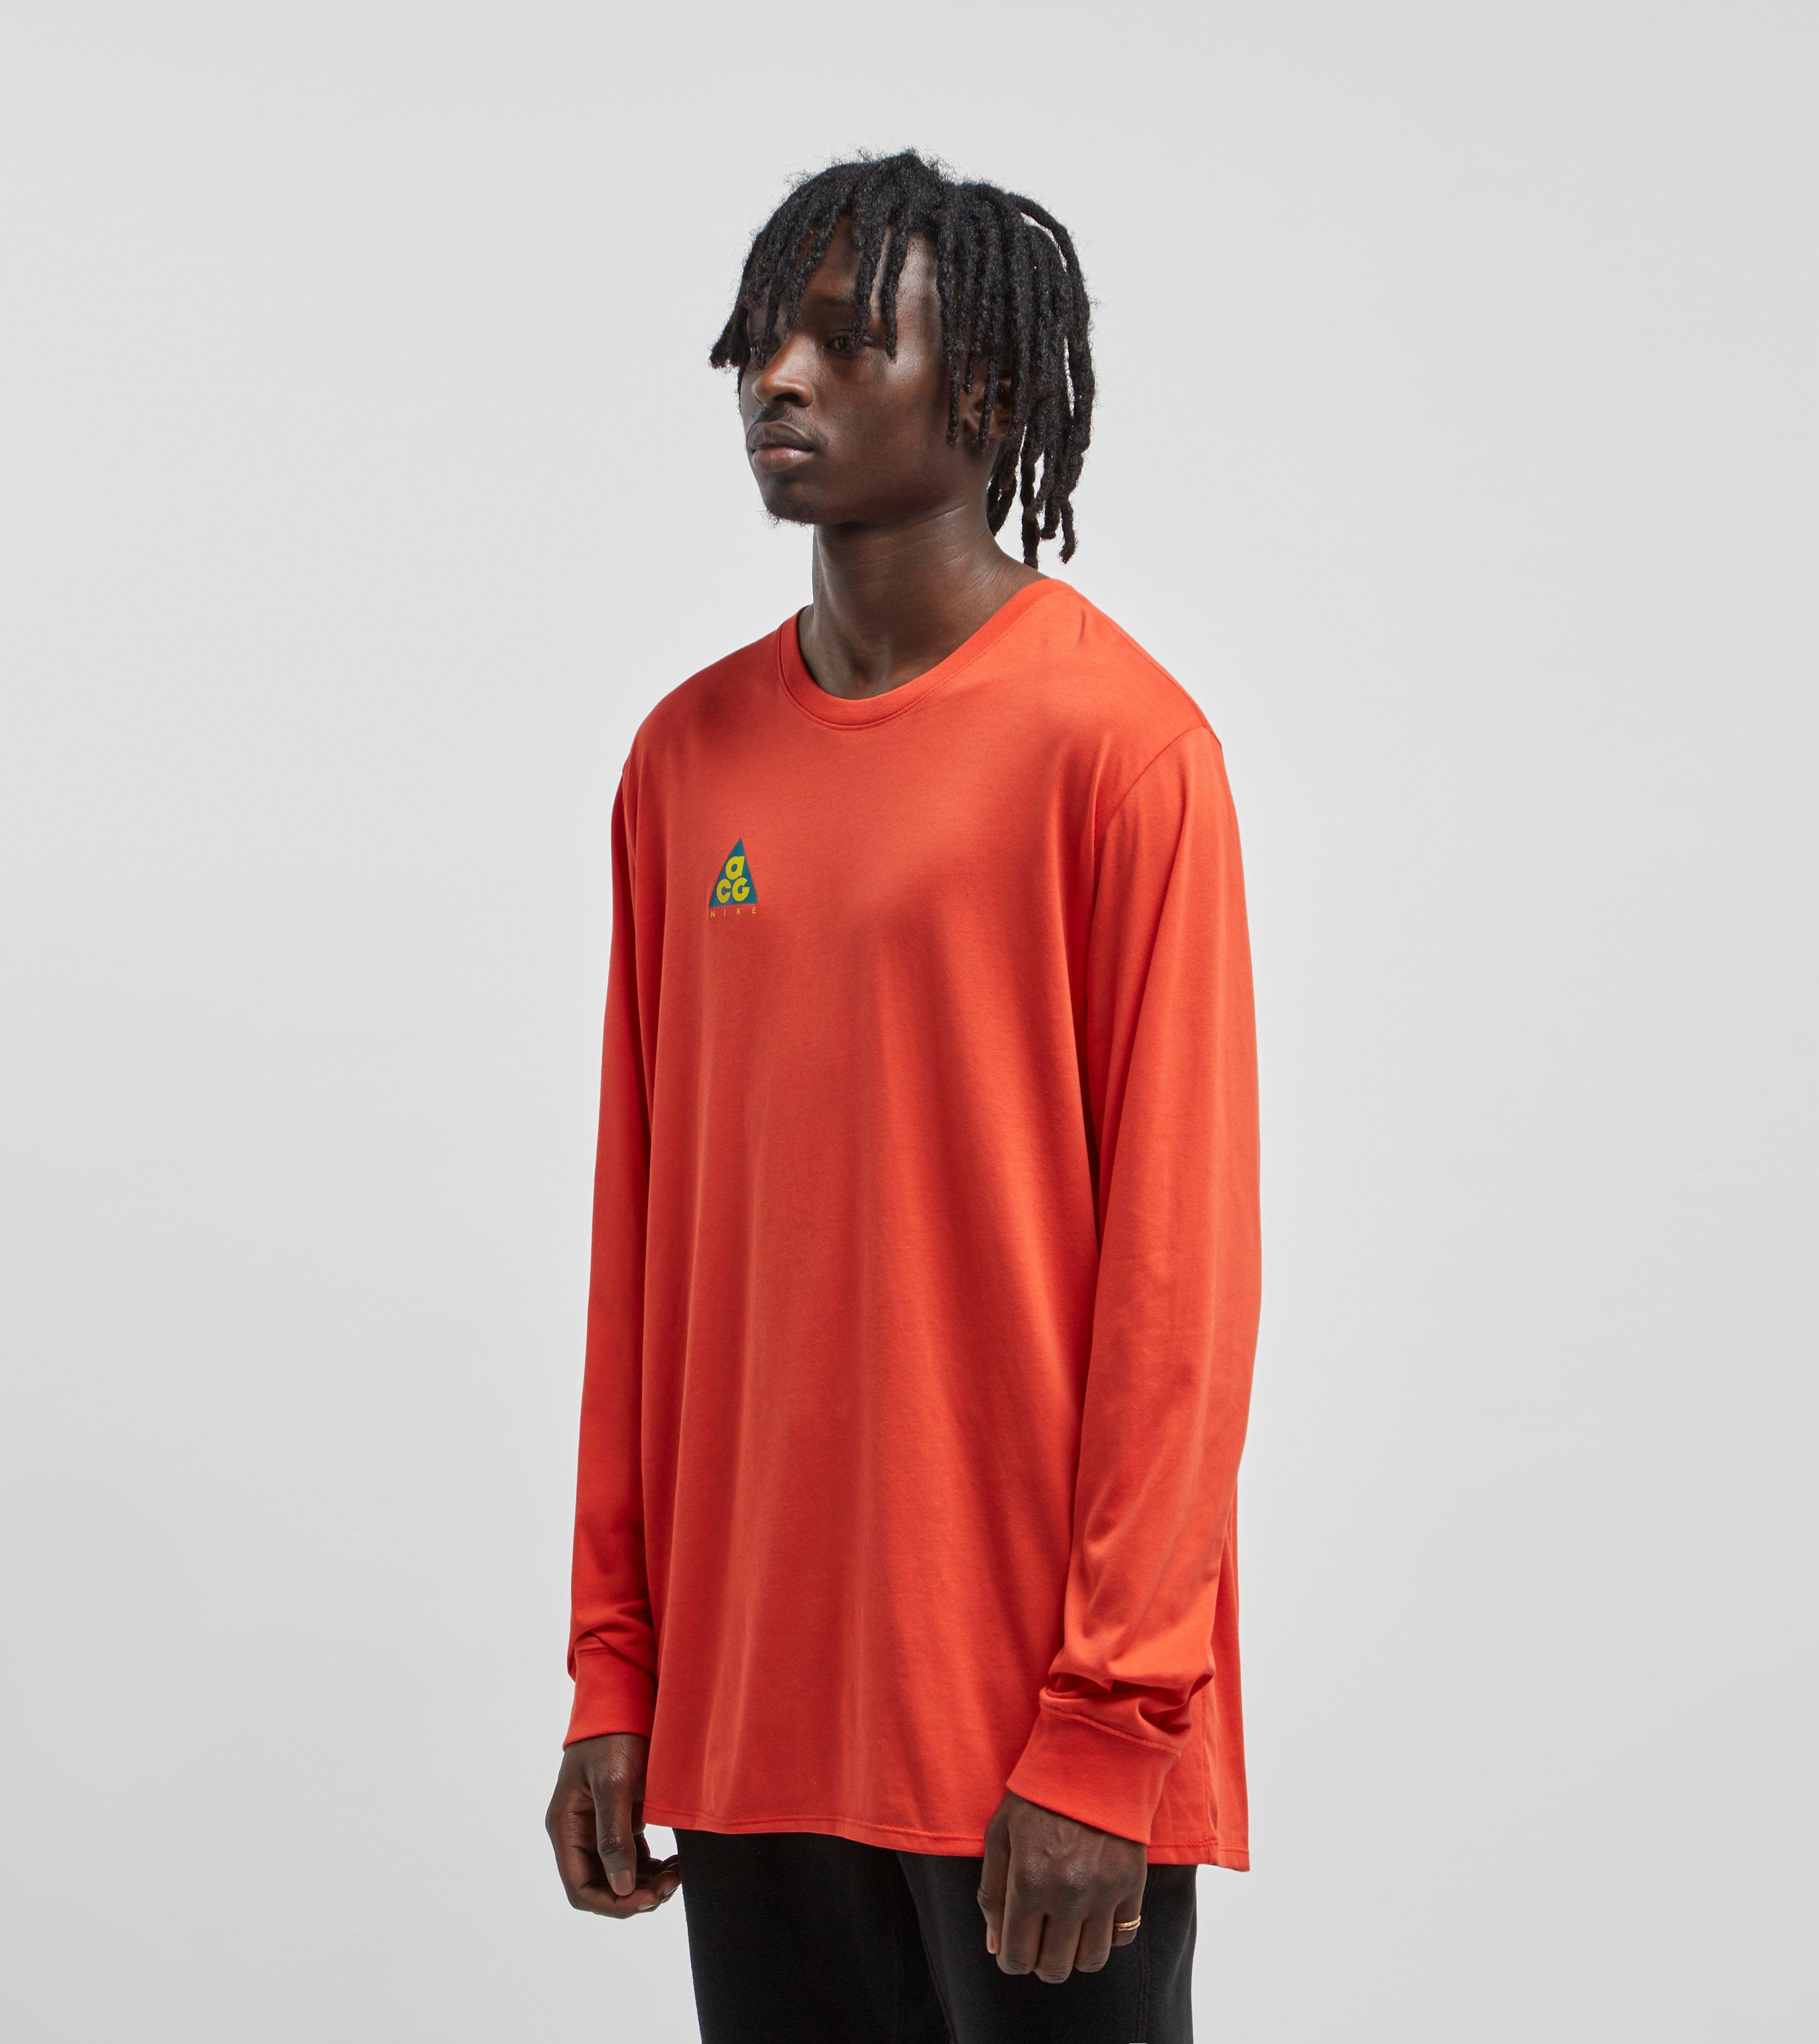 d6ffc9e8 Nike - Red Acg Long-sleeved T-shirt for Men - Lyst. View fullscreen